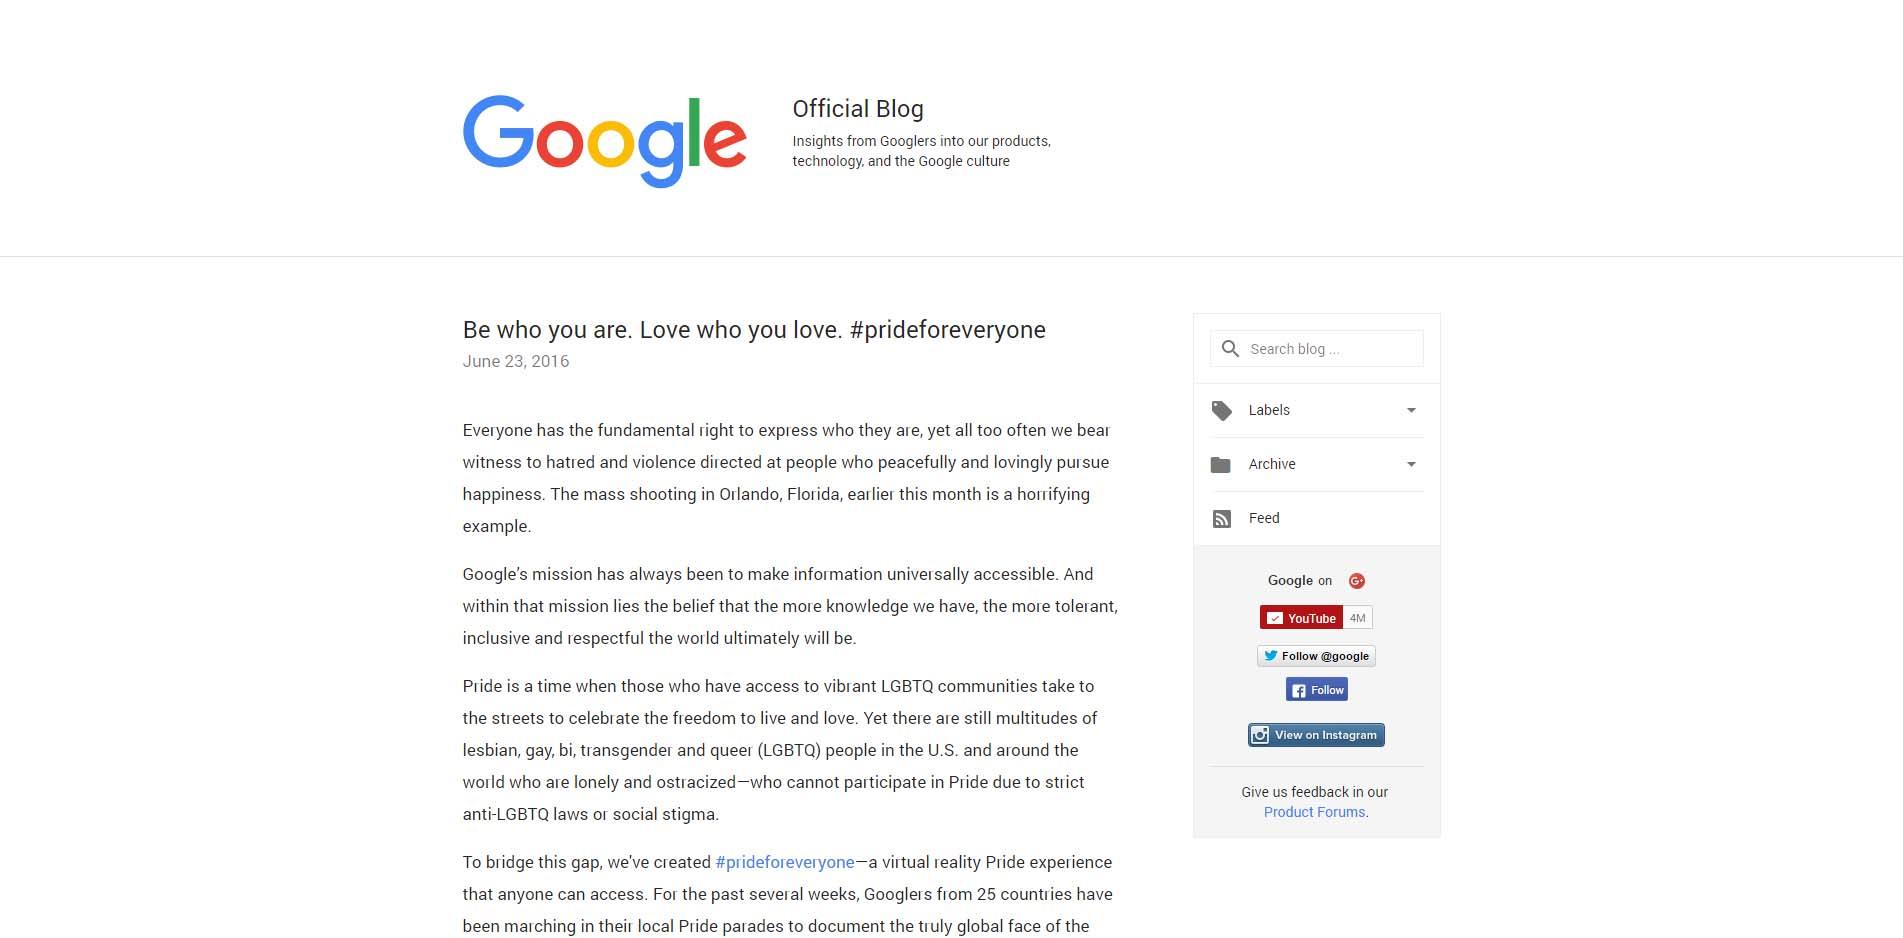 seo-blog-googleblog-blogspot-ch